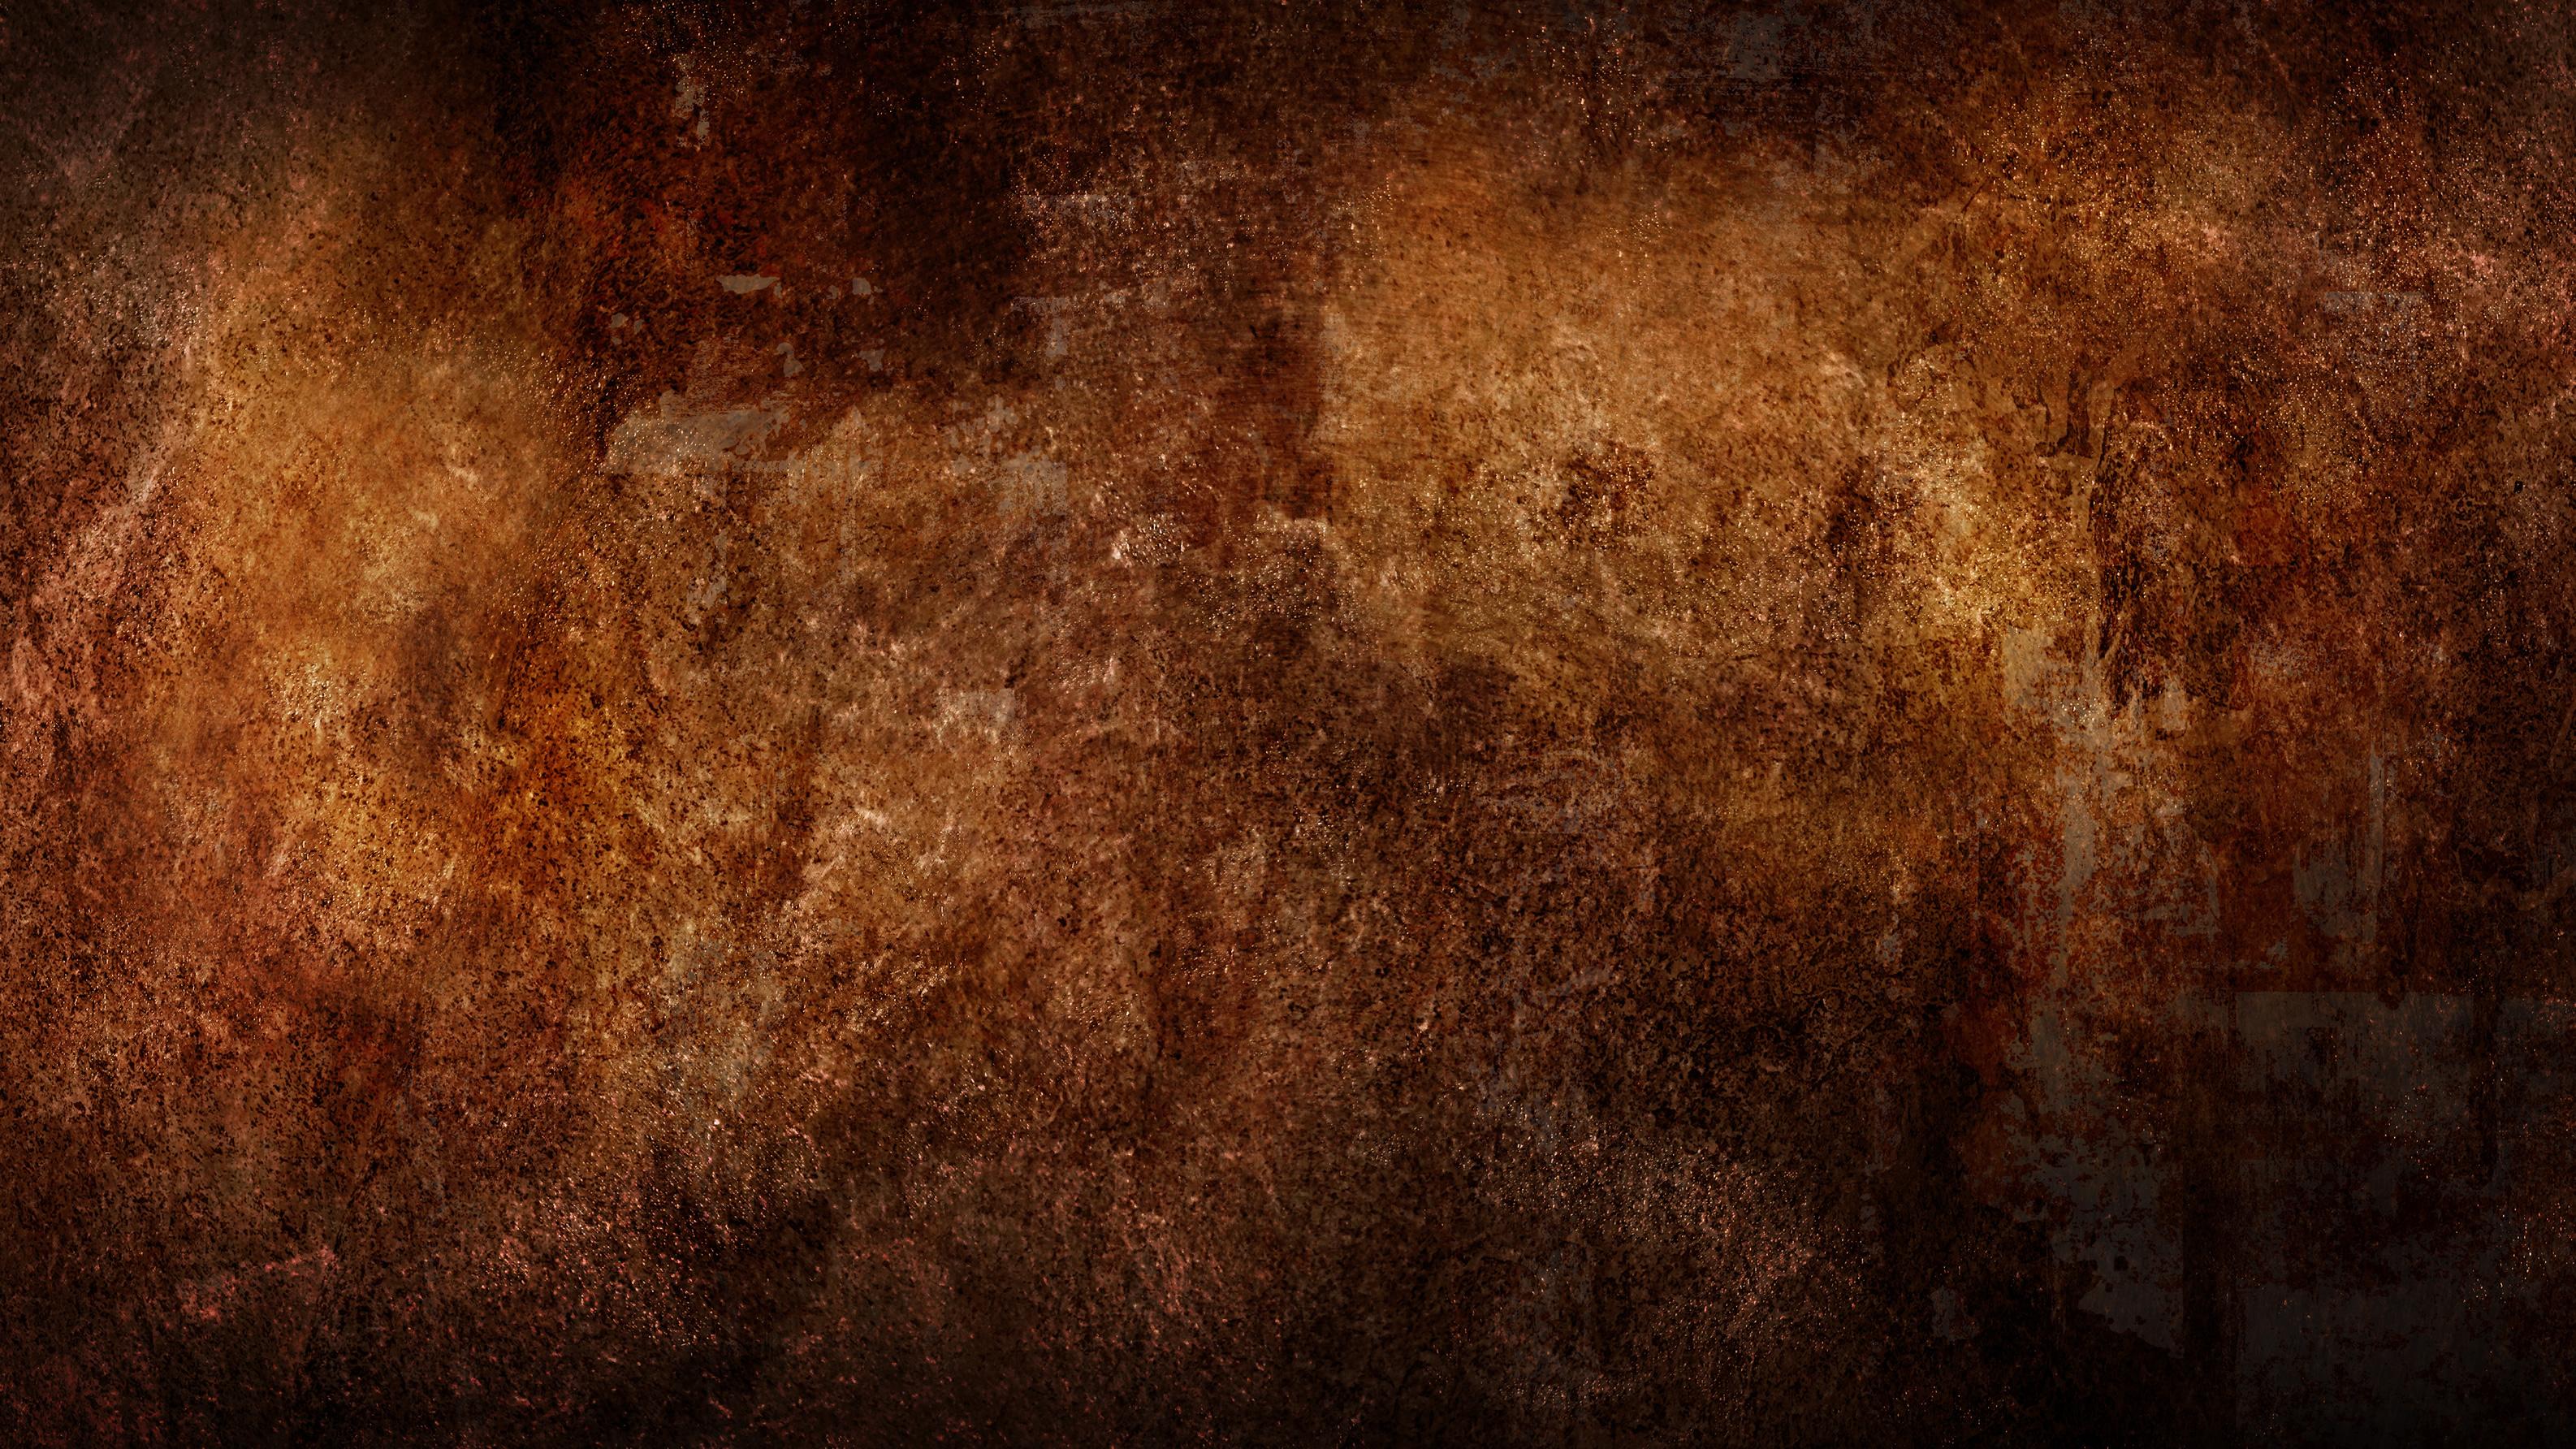 Rust metal texture background old metal texture image 3172x1784